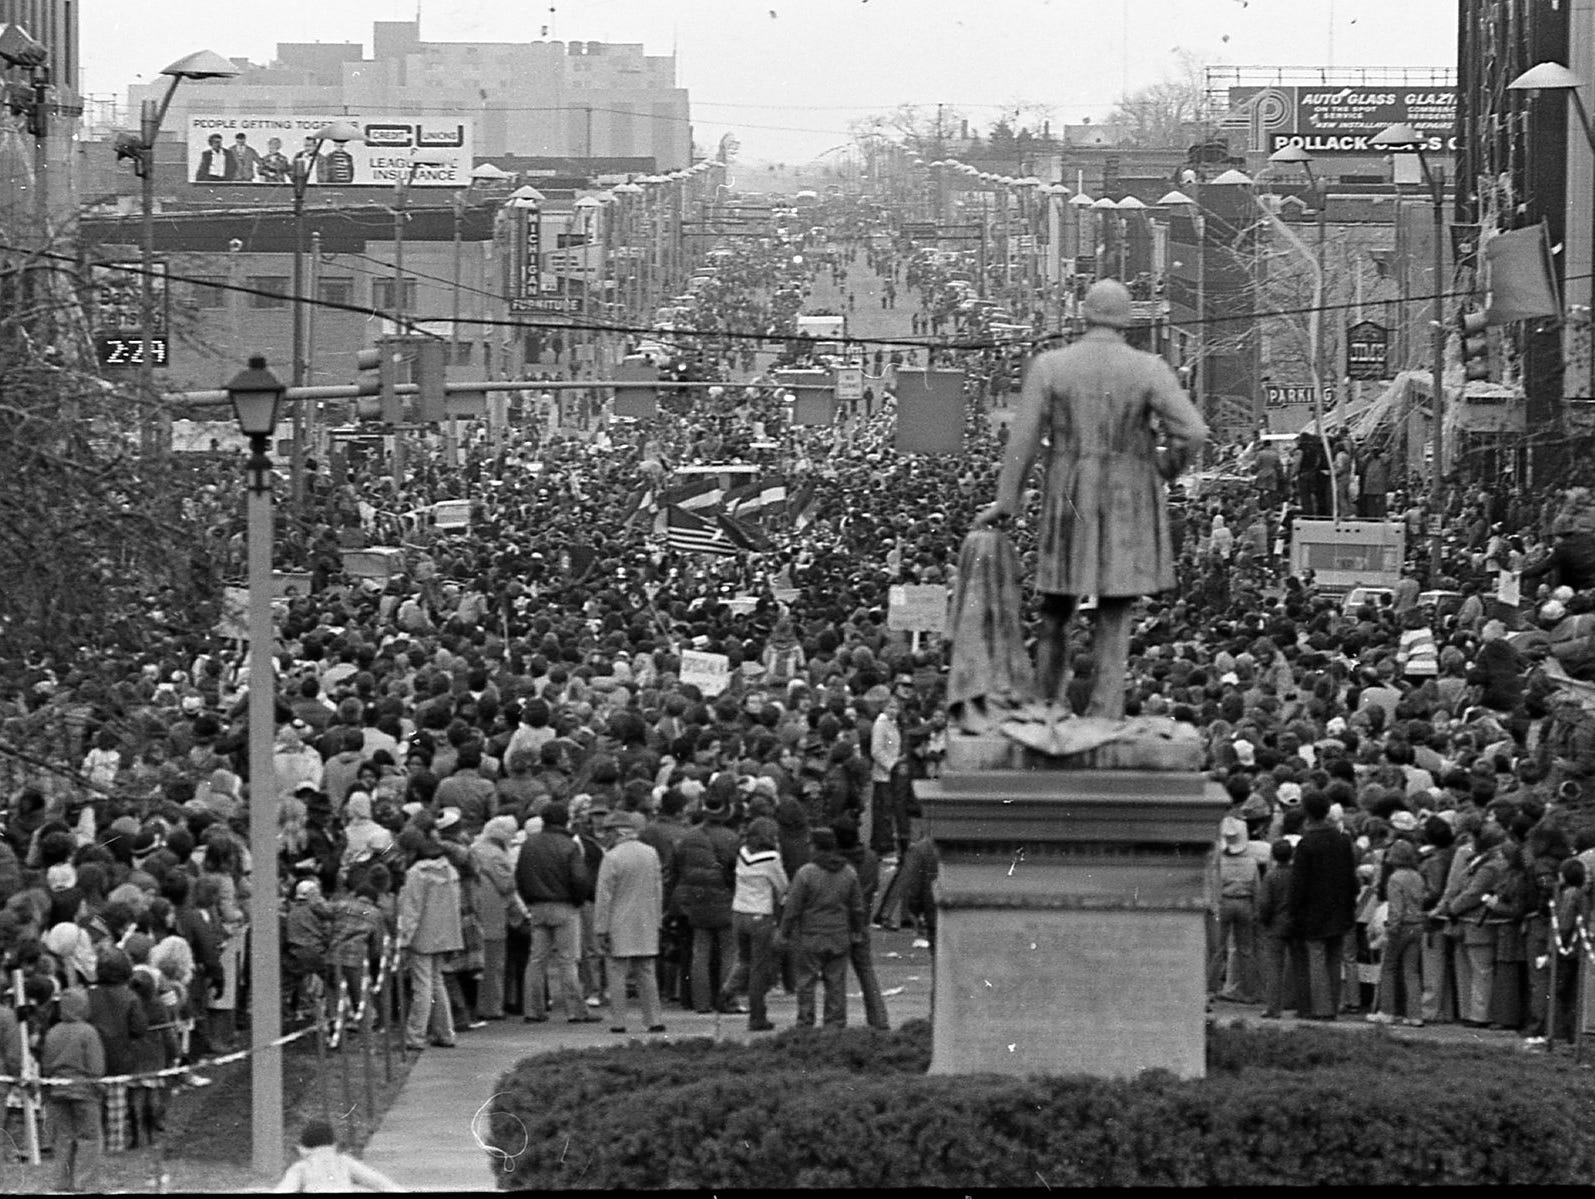 1979 : Parade of Champions Celebrates MSU's 1st Basketball Championship